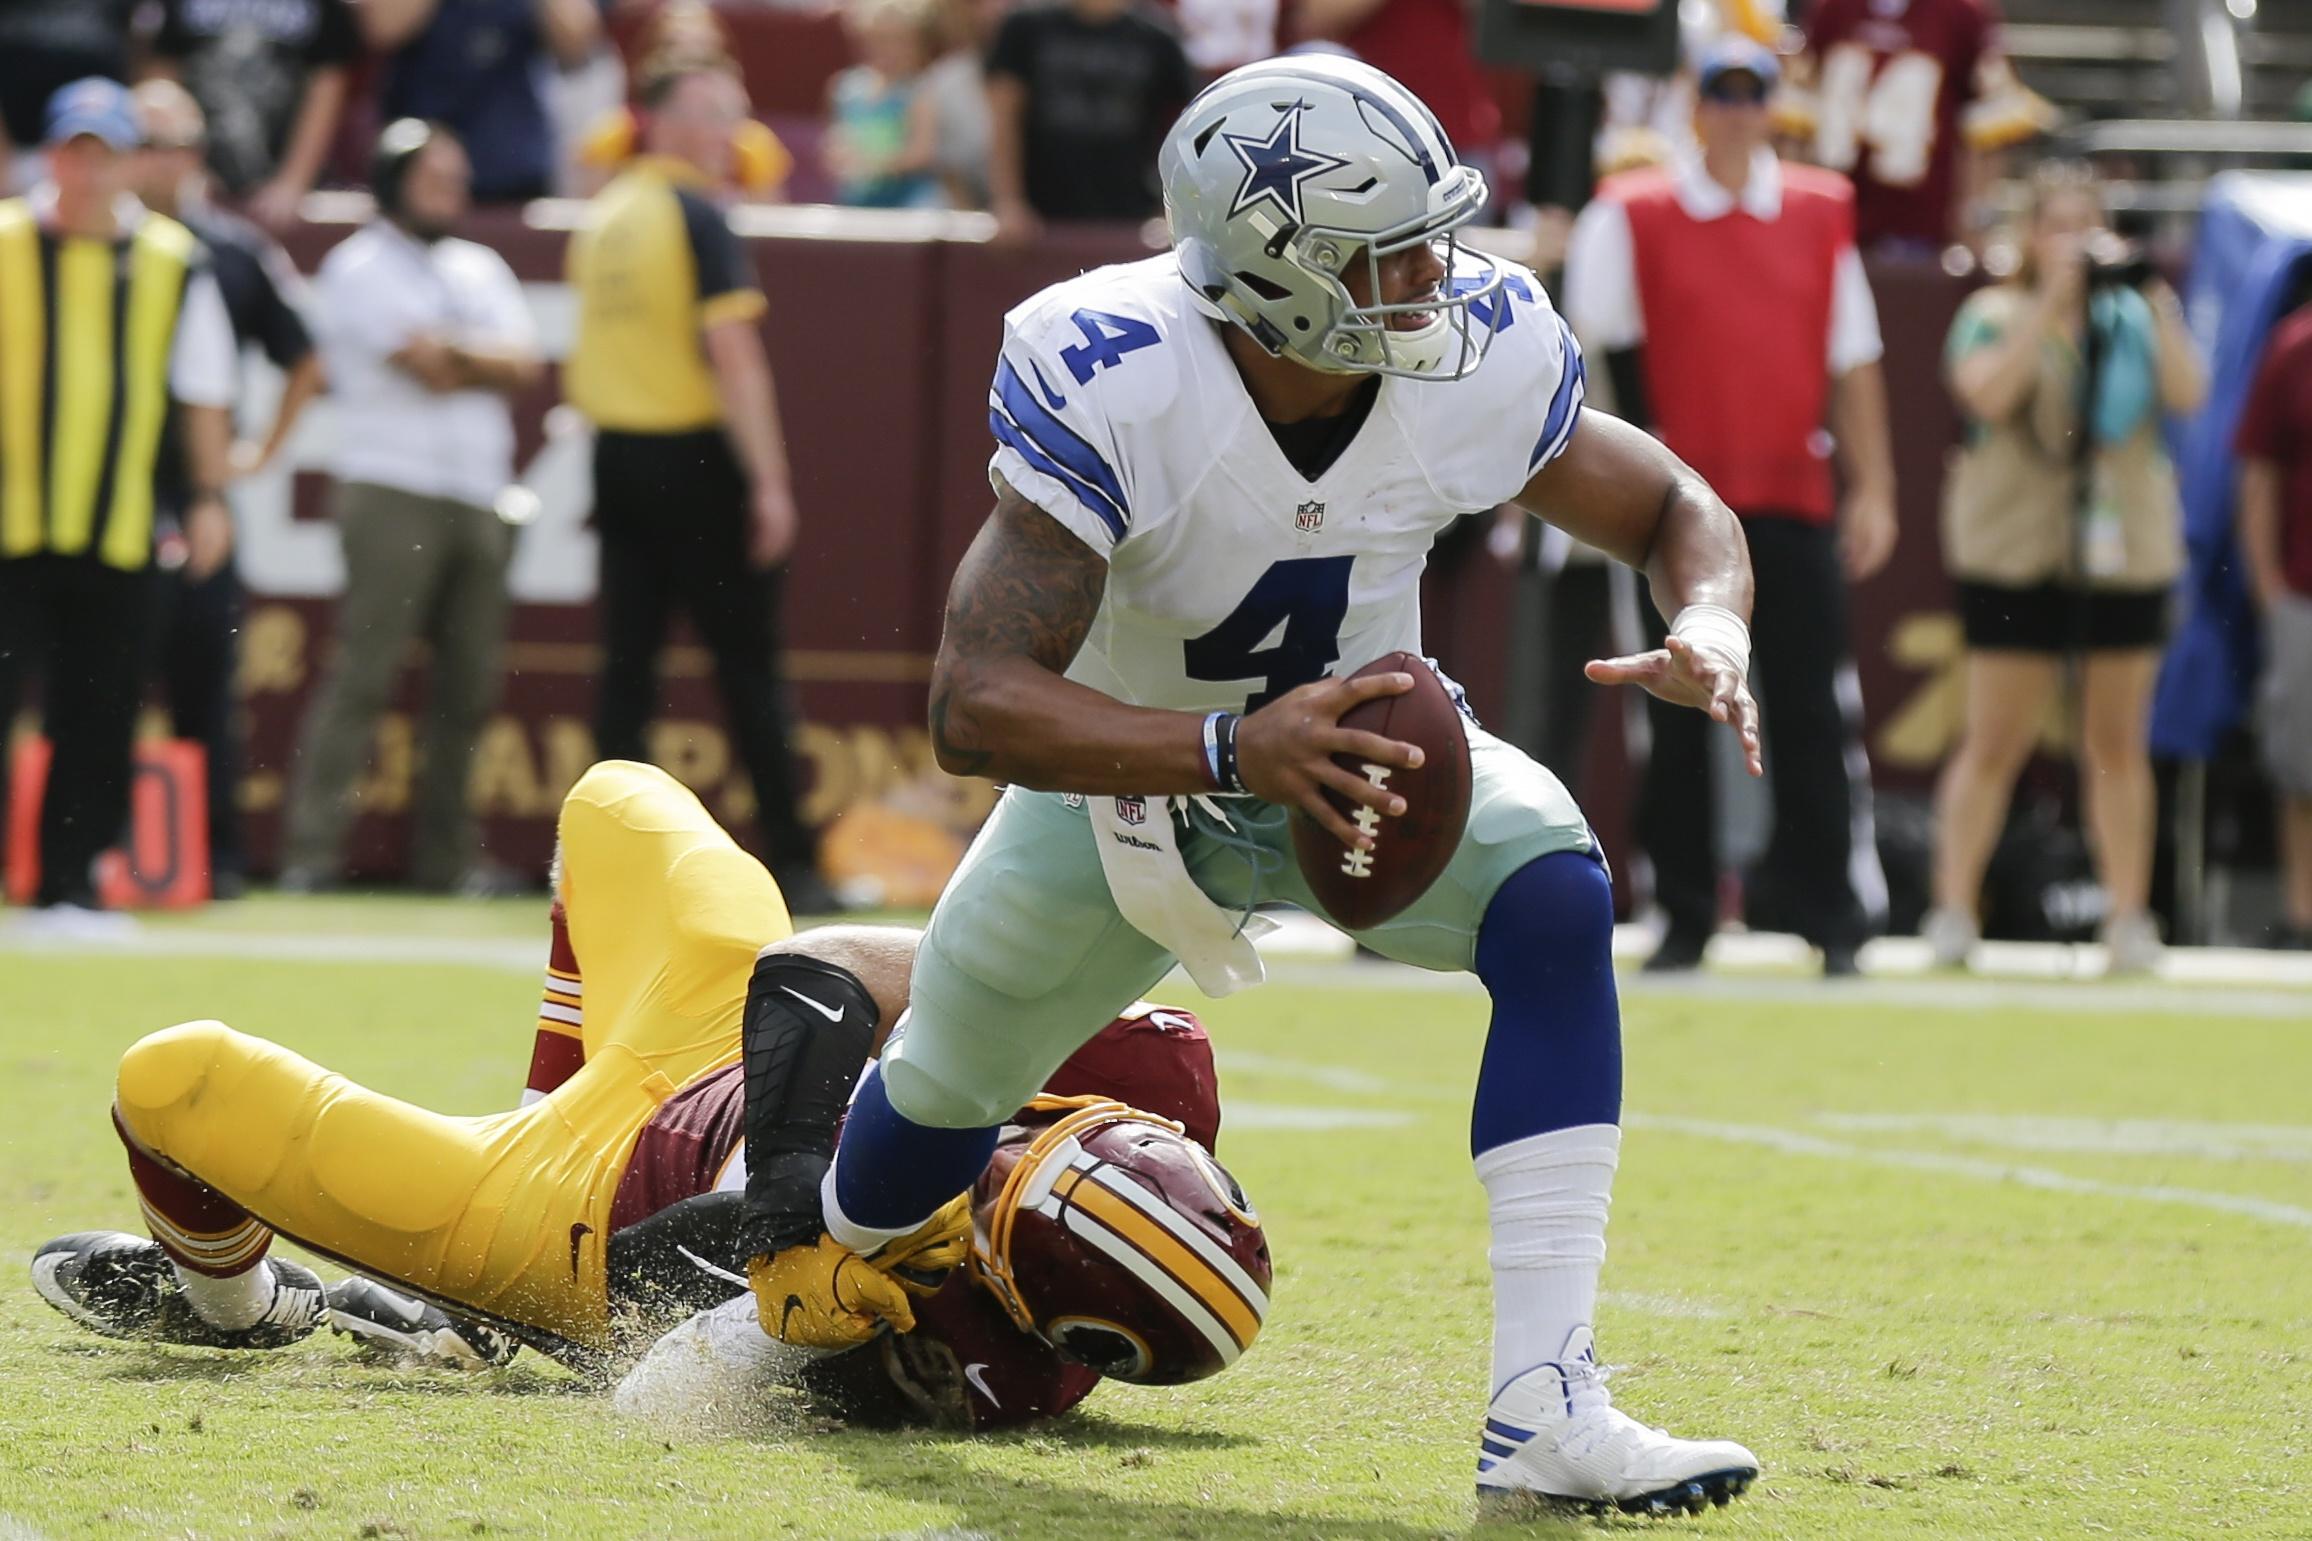 Cowboys-redskins-thanksgiving-game-is-nfls-most-expensive-week-12-ticket